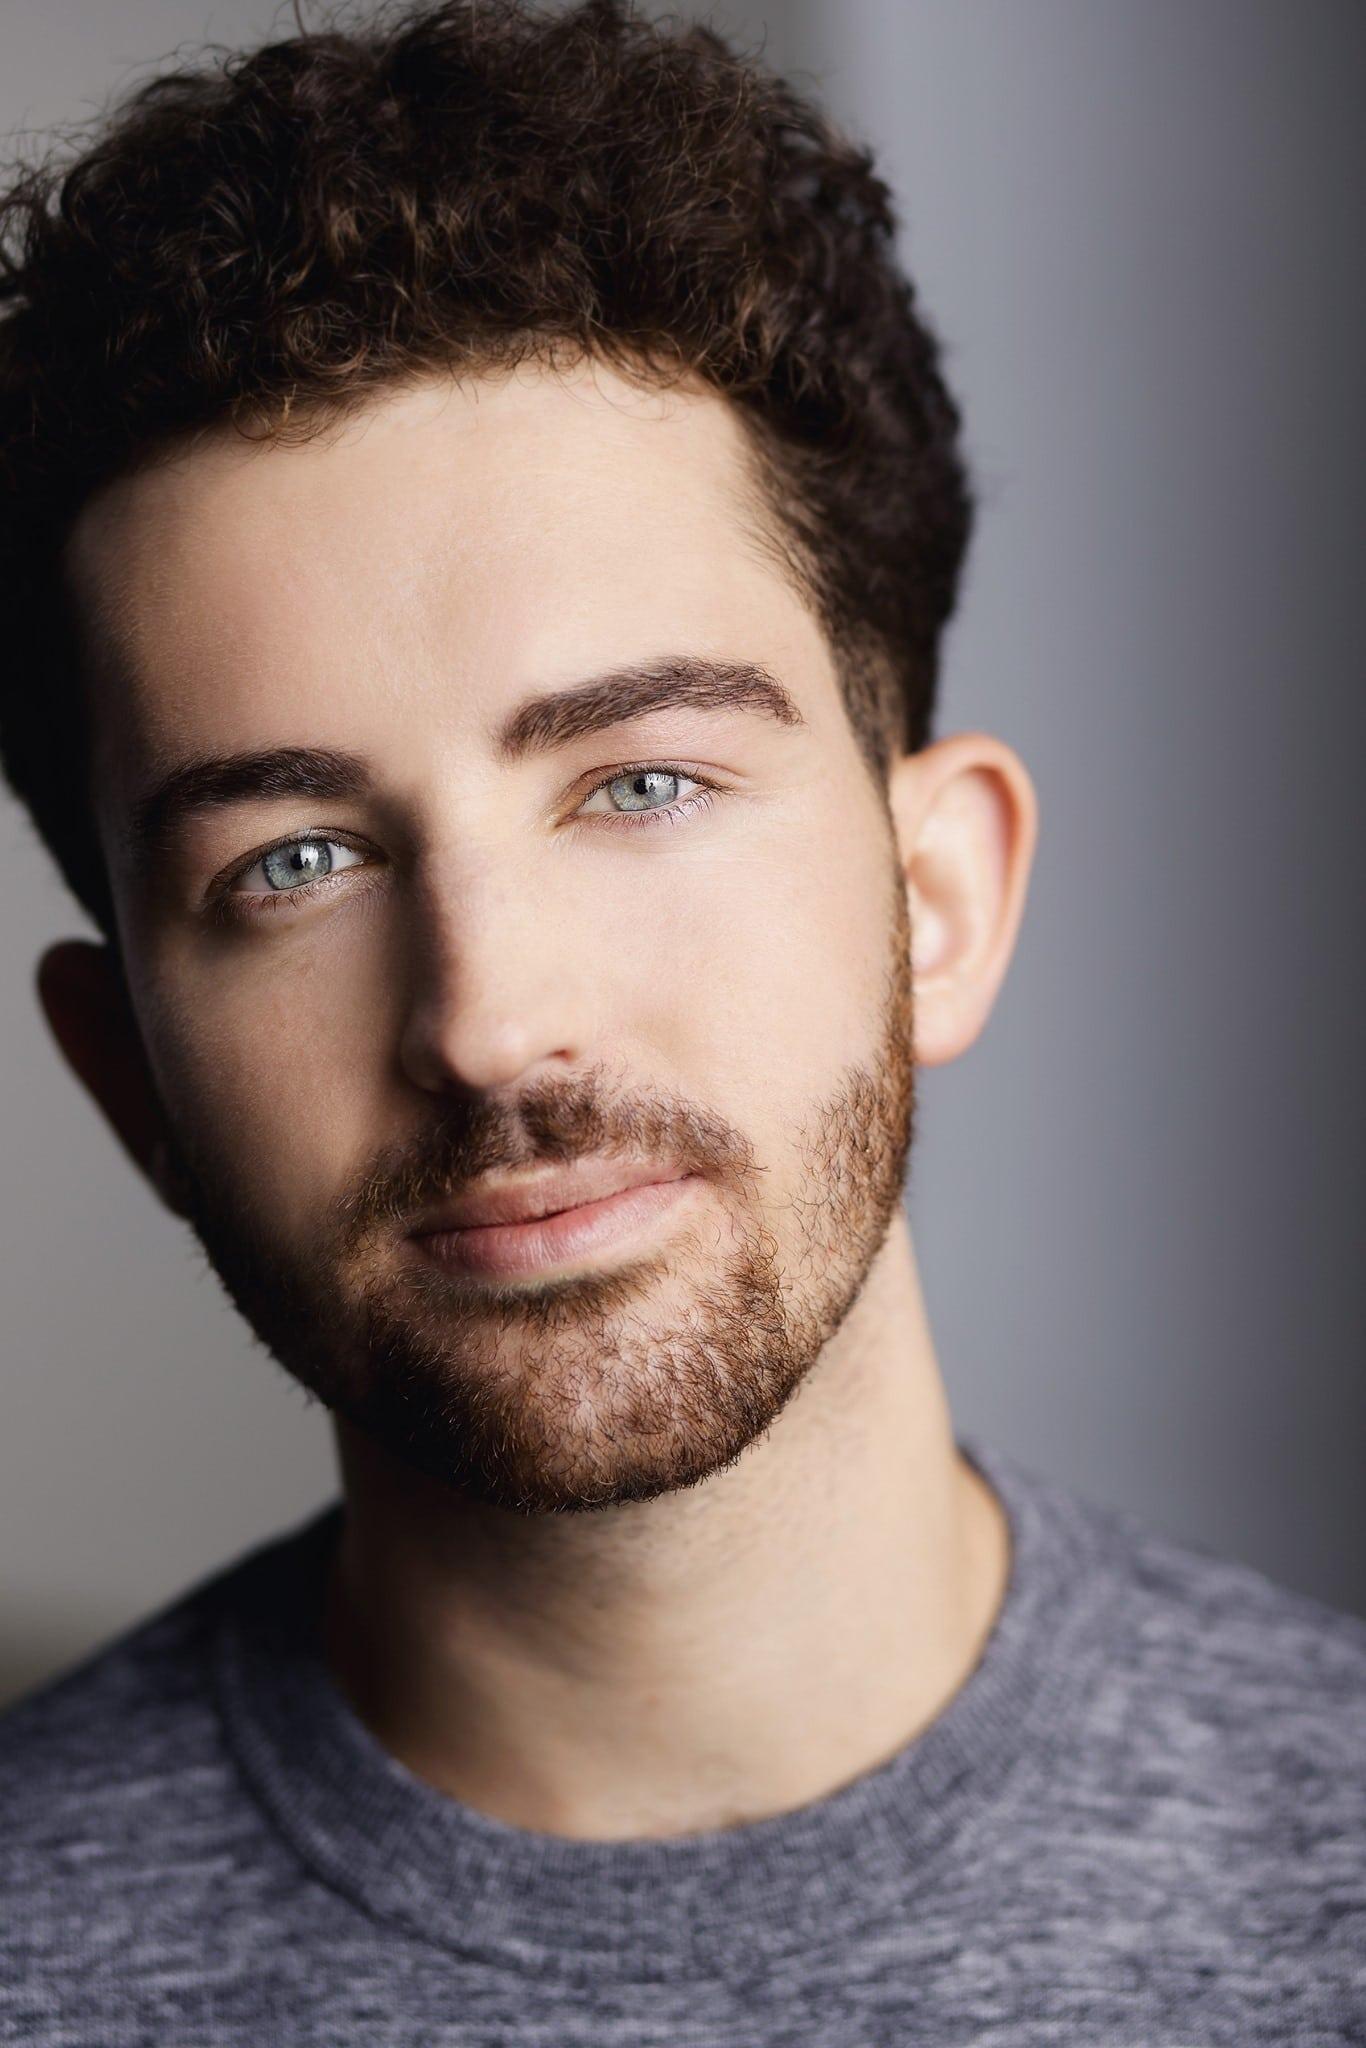 Tristan McIntyre